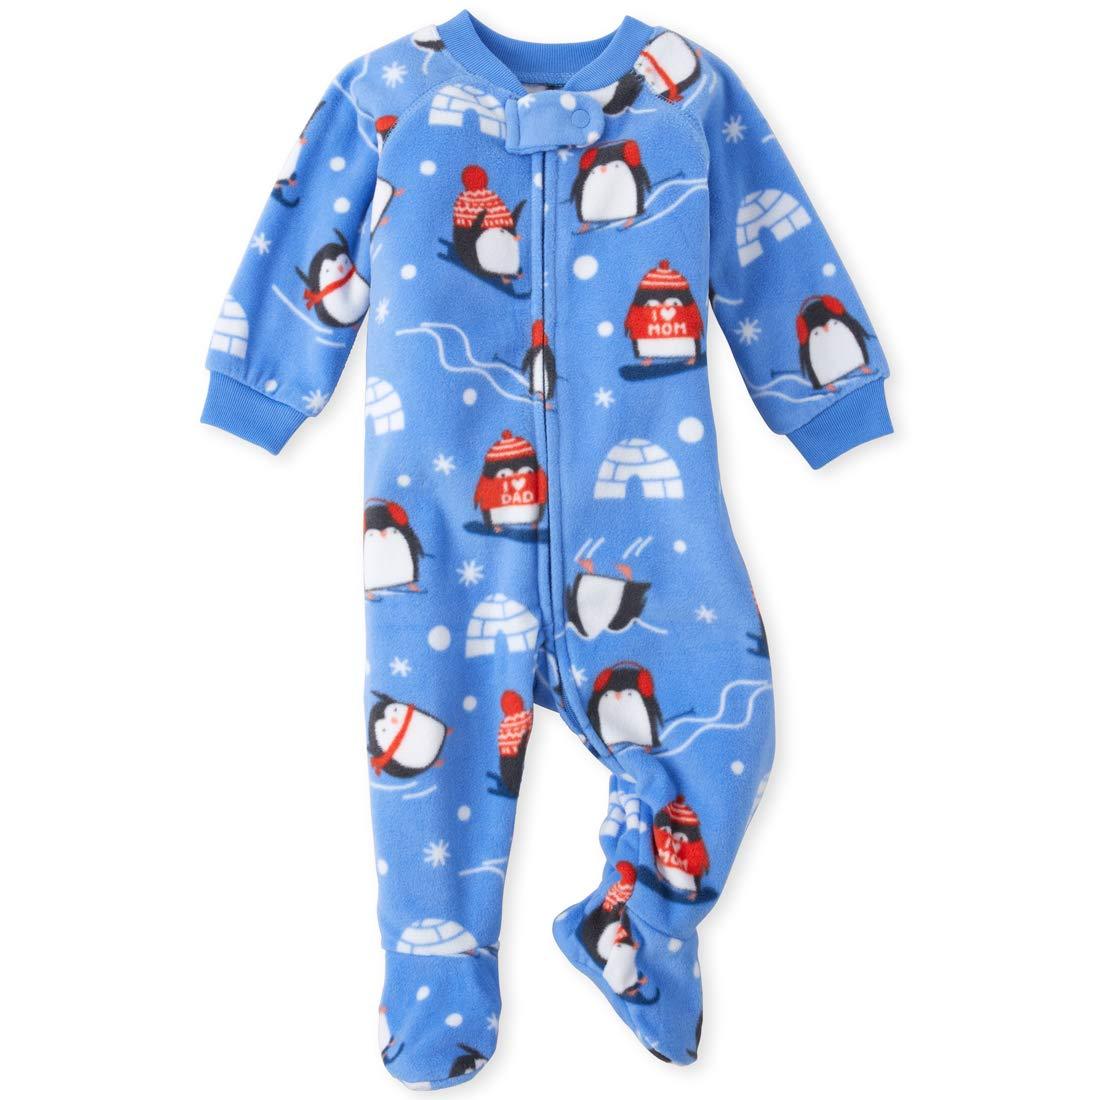 The Children's Place Baby Boys Blanket Sleeper